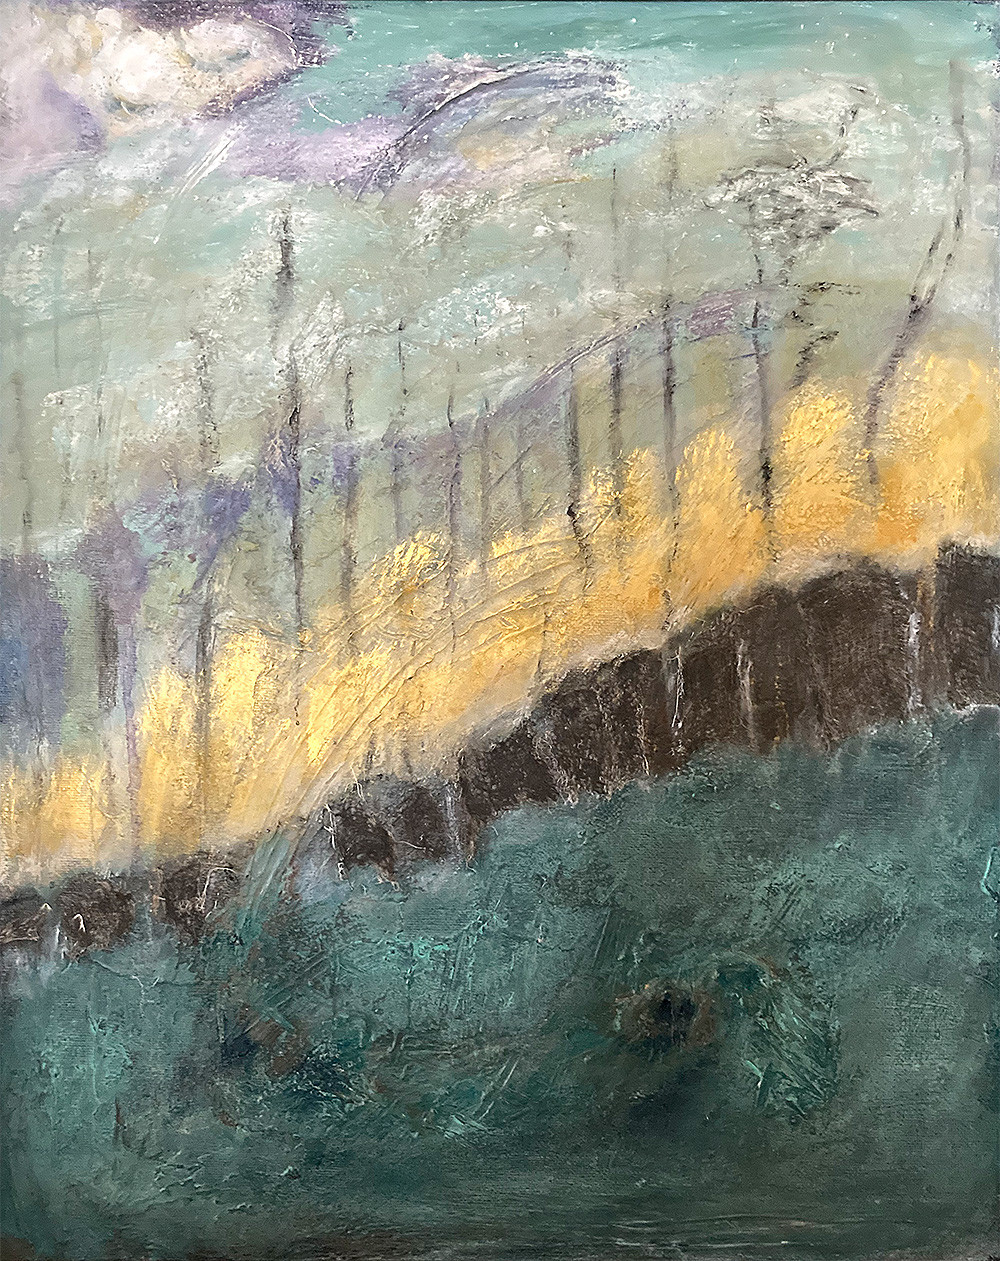 Awakening - a painting by Cynthia Reynolds